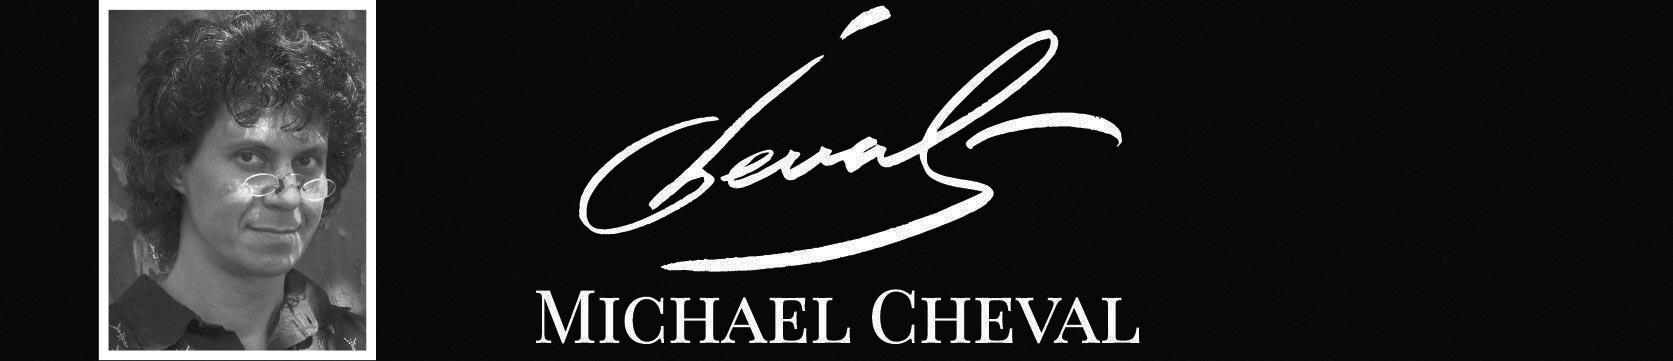 Michael Cheval Artwork